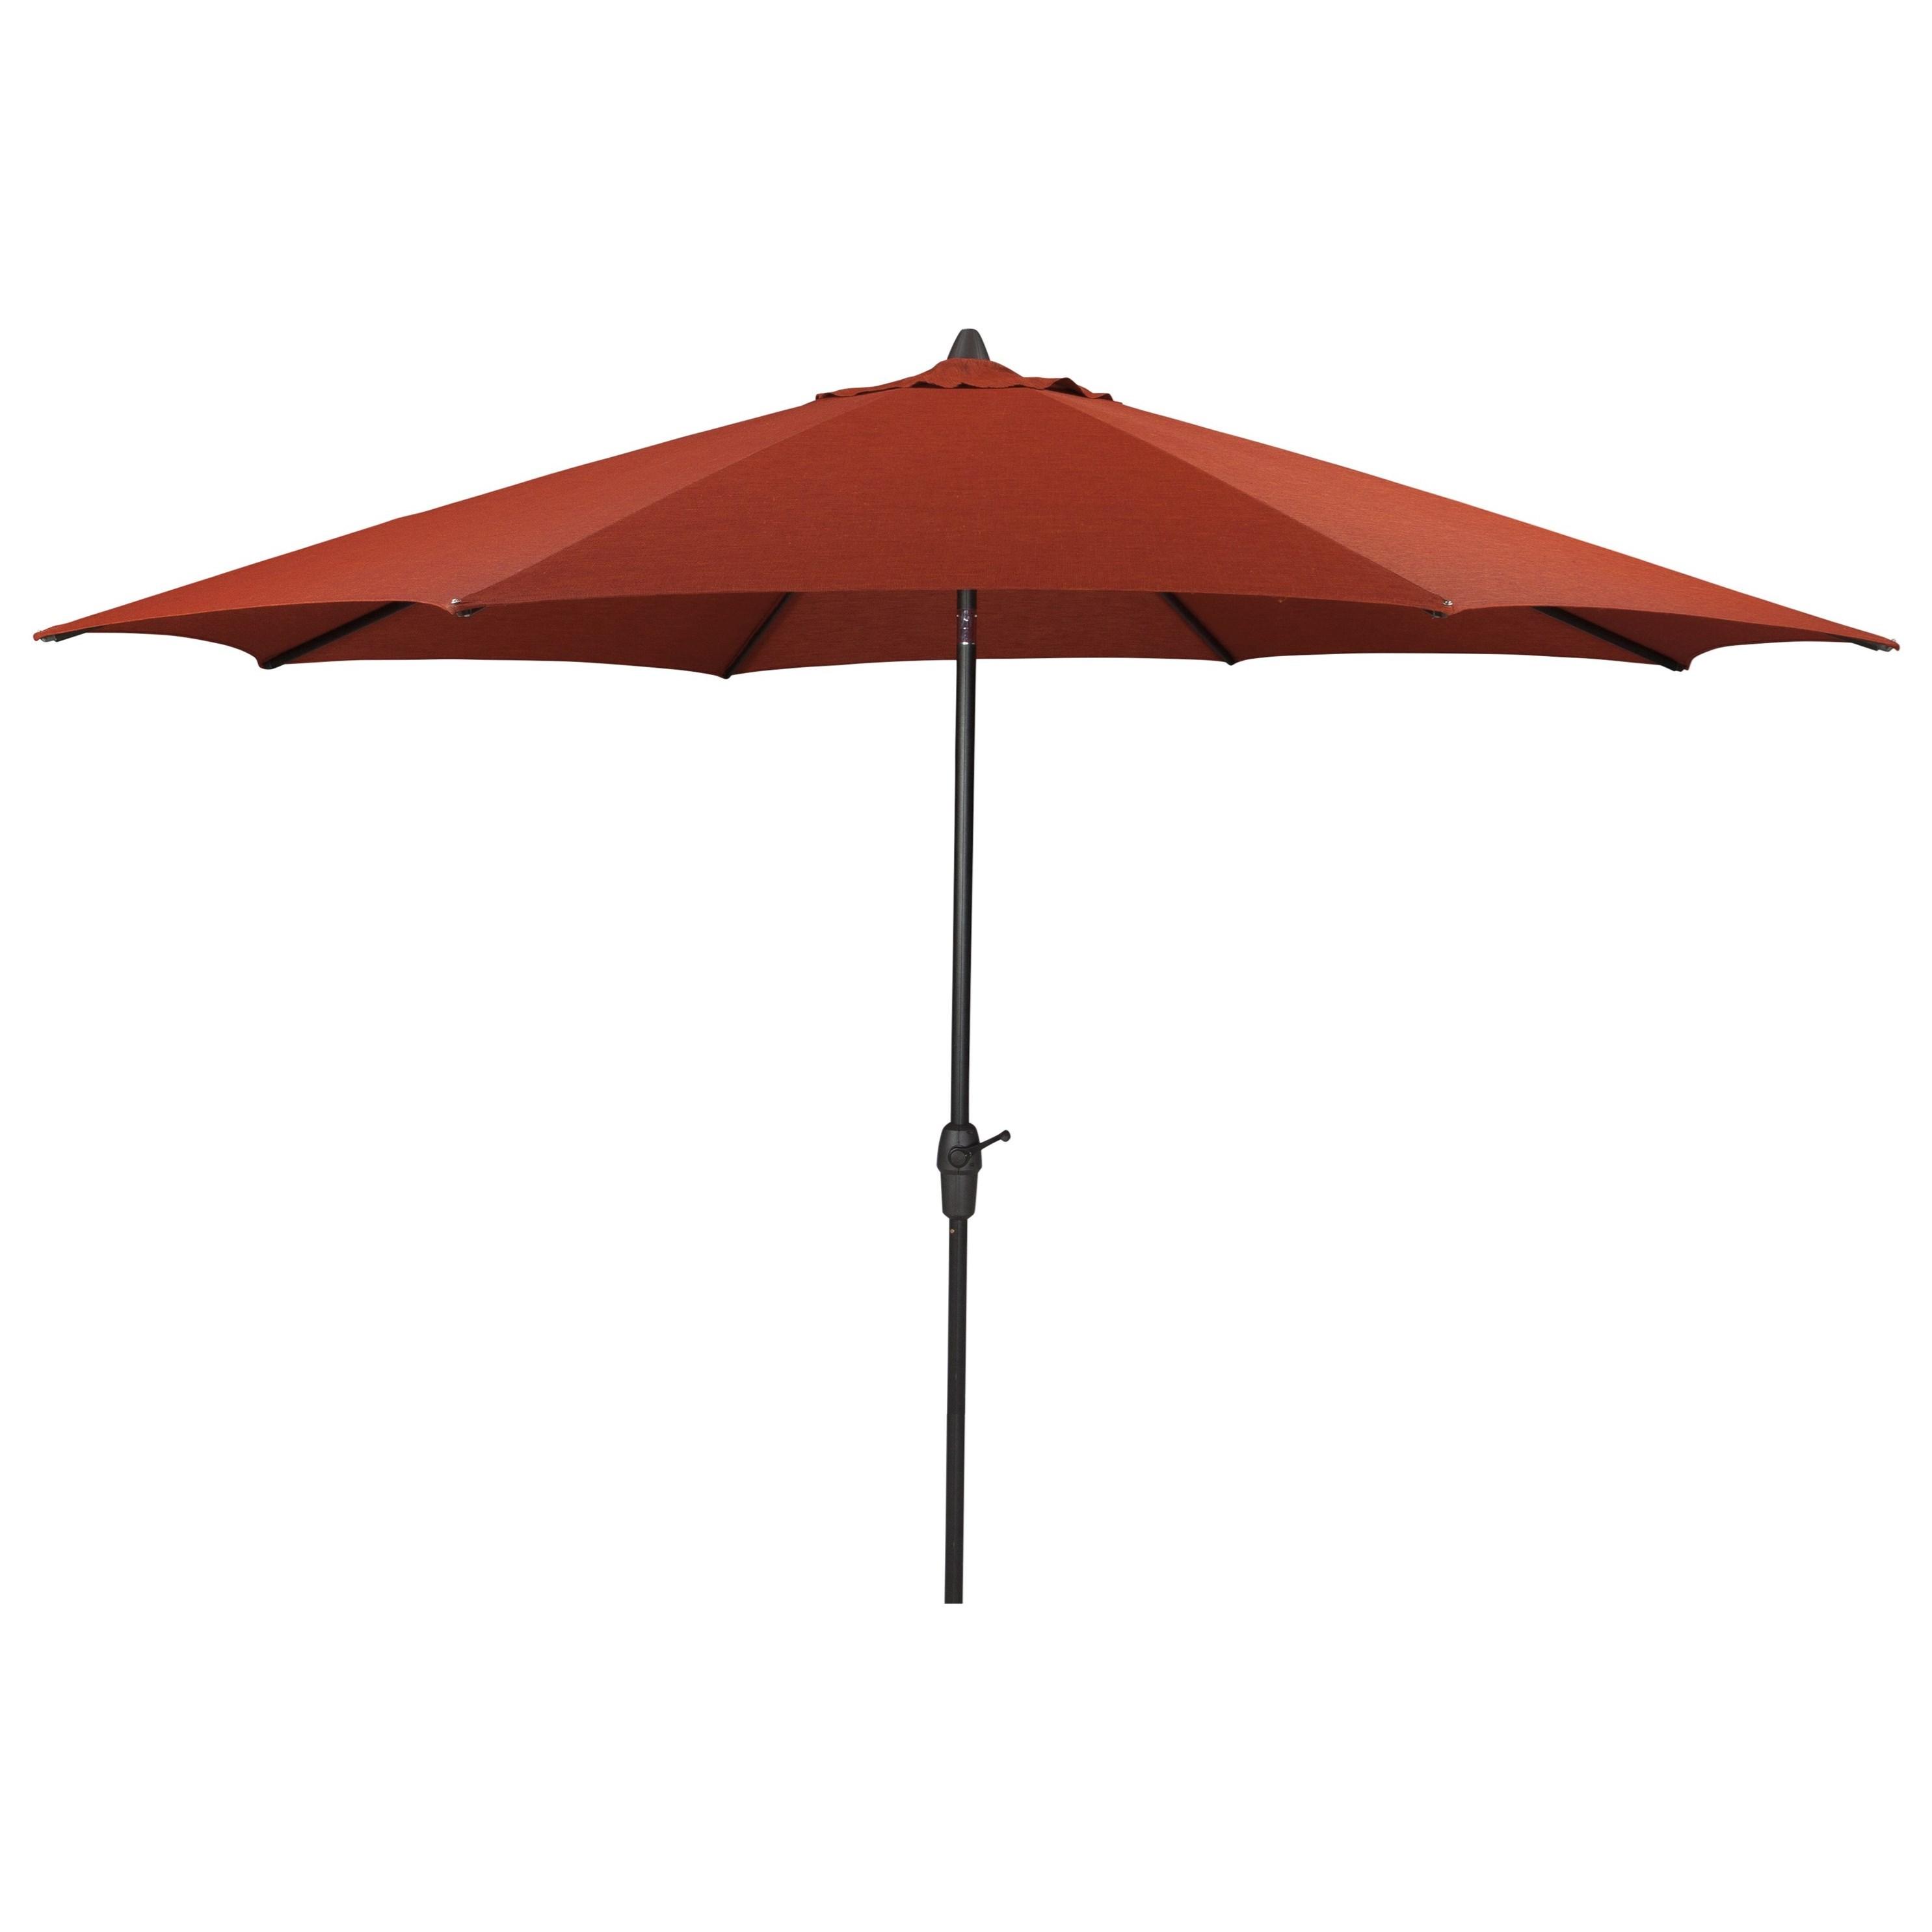 Signature Design By Ashley Umbrella Accessories Large Auto Tilt Umbrella Wayside Furniture